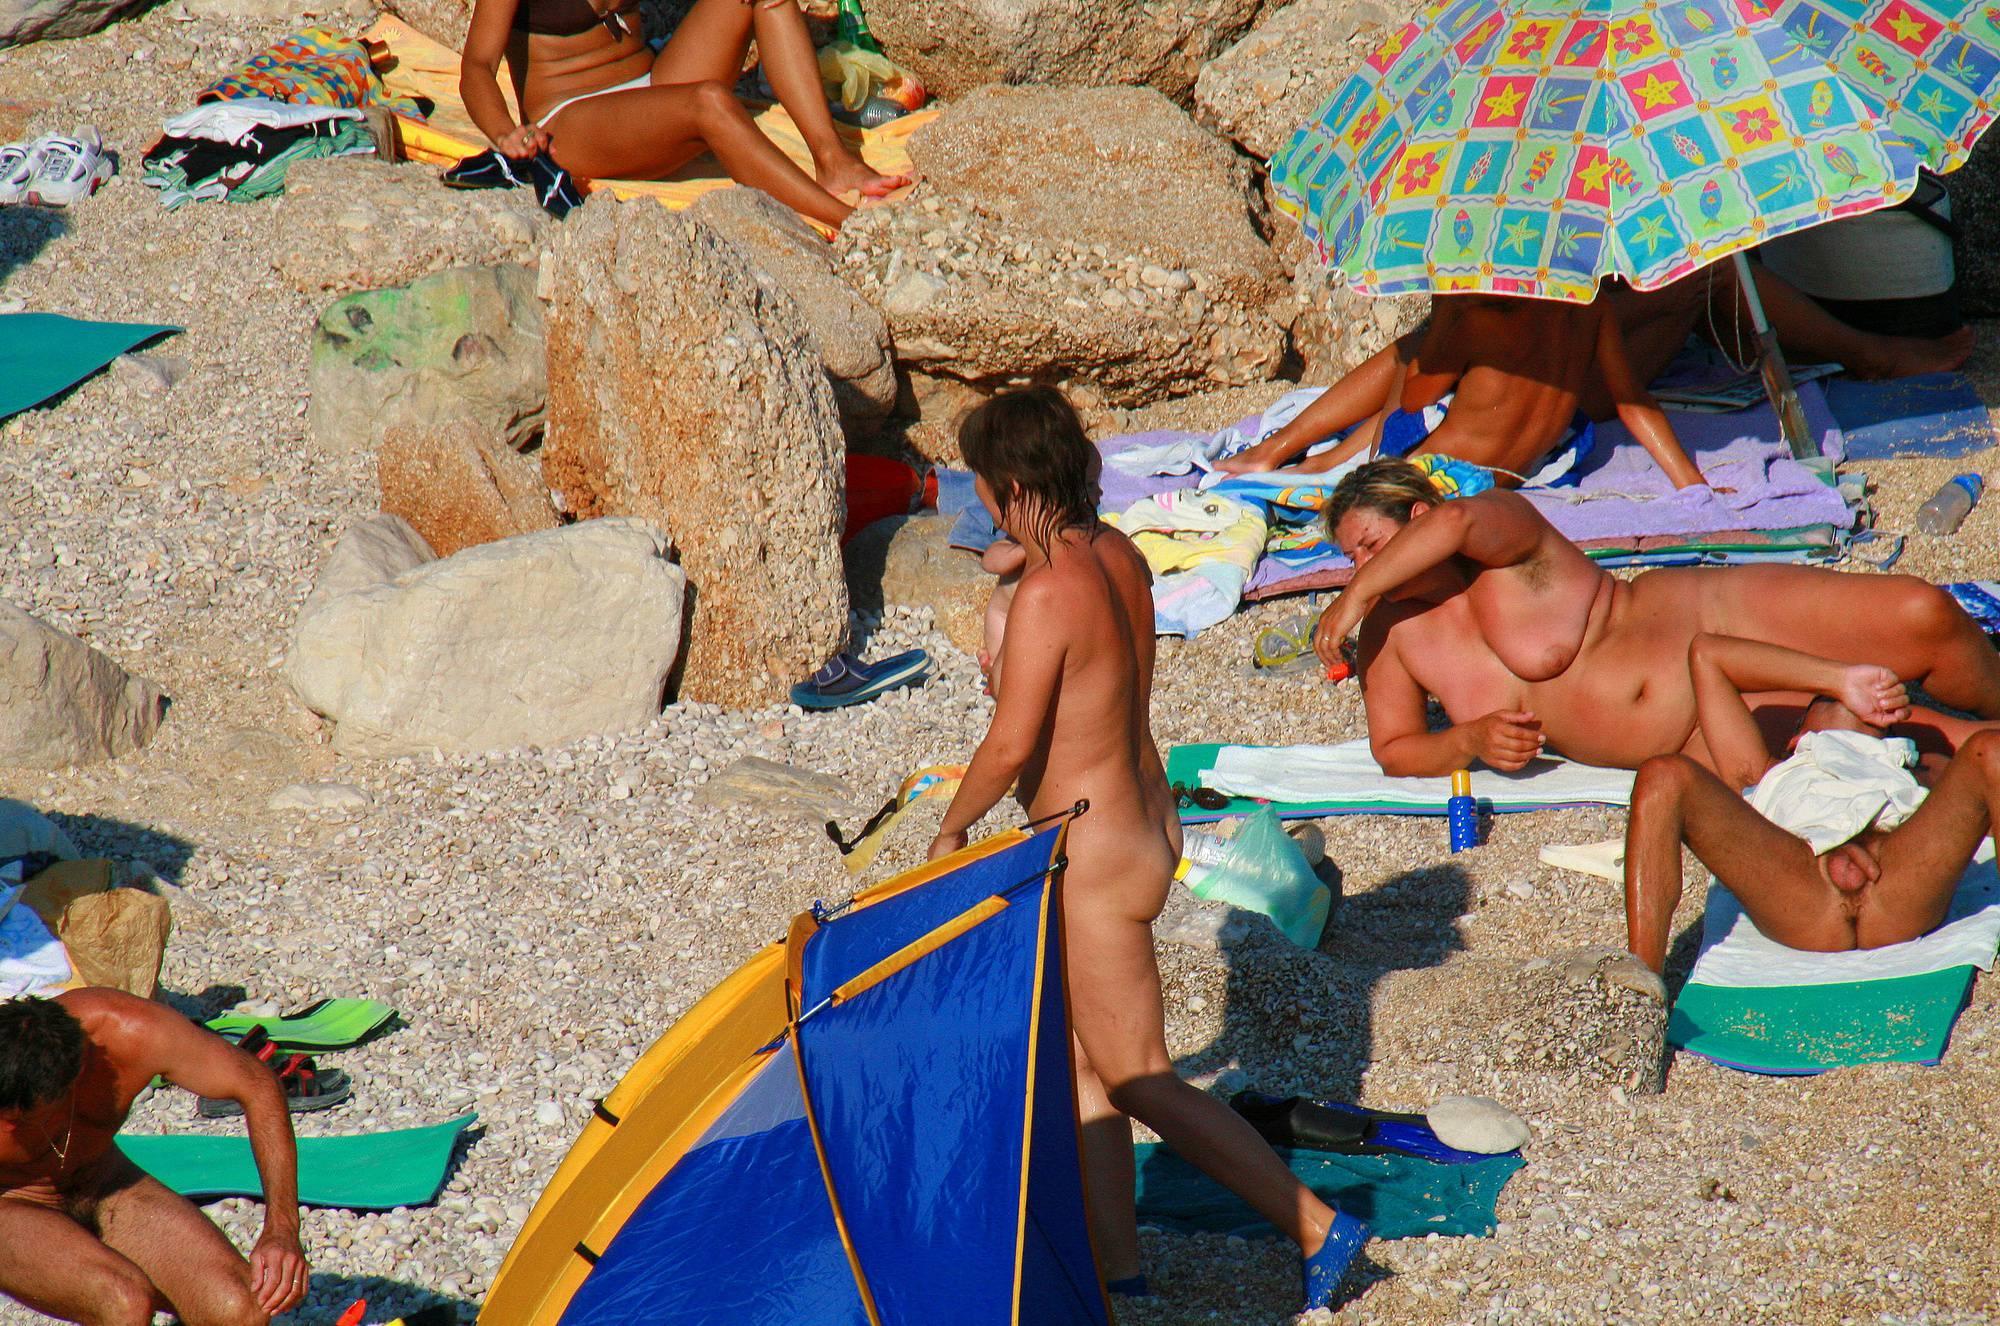 Nudist Photos Ula FKK Beach Field Pass - 2